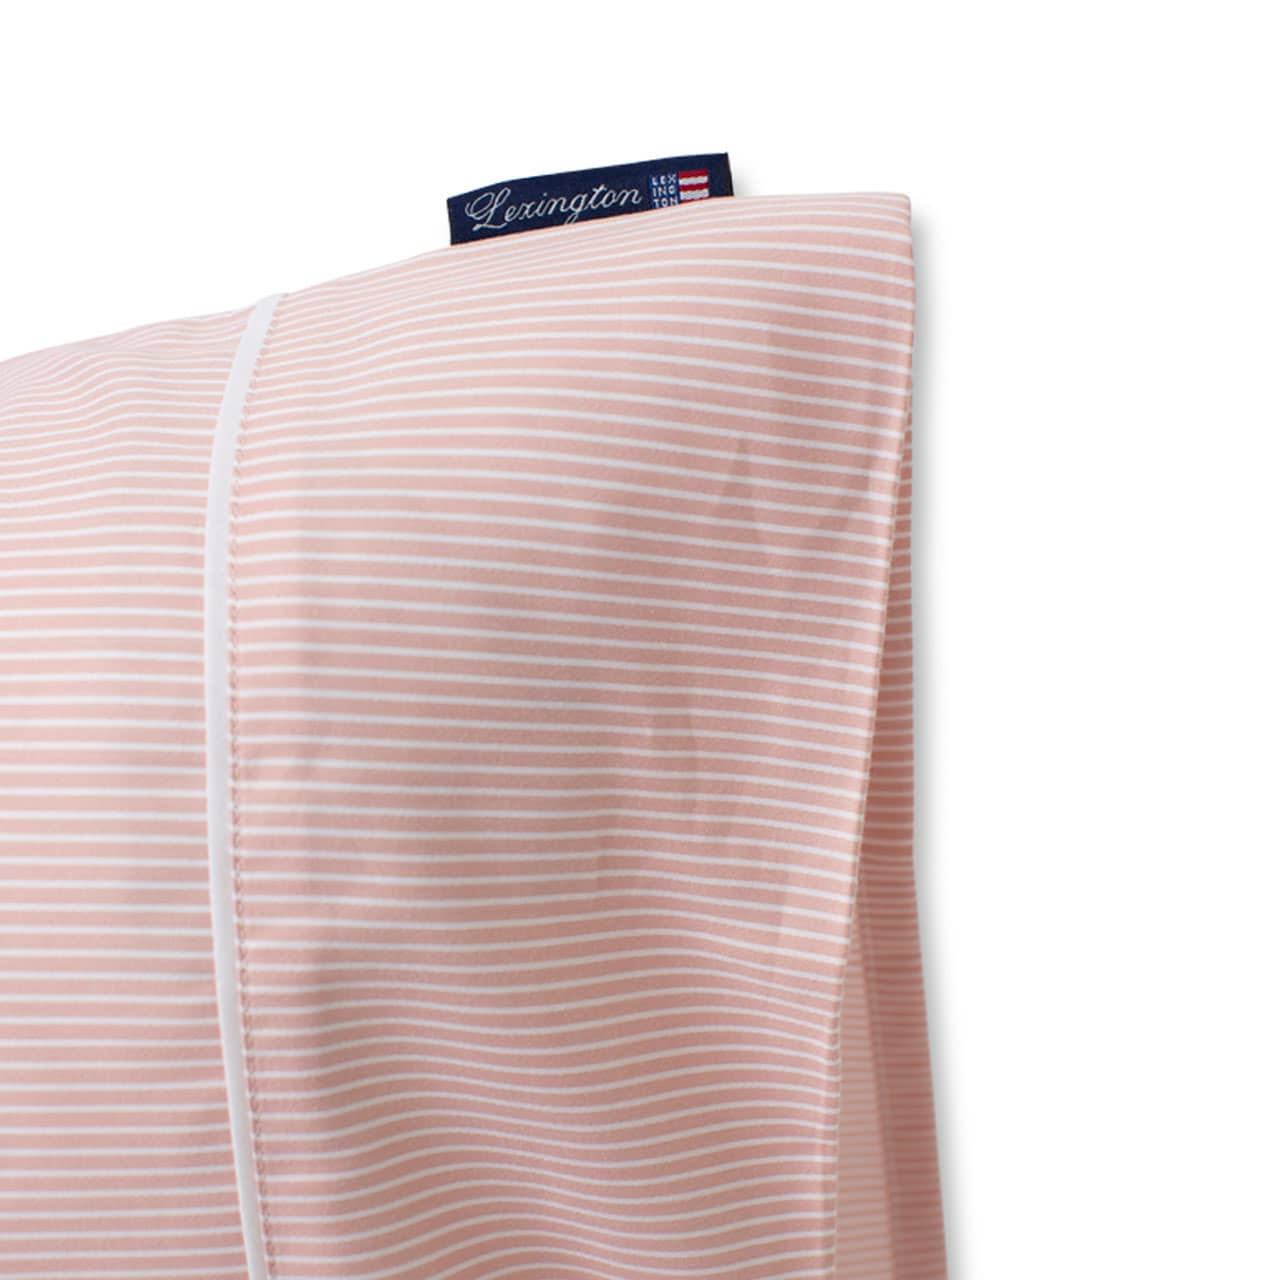 "LEXINGTON COMPANY - Bettdeckenbezug ""Striped Tencel/Cotton"""